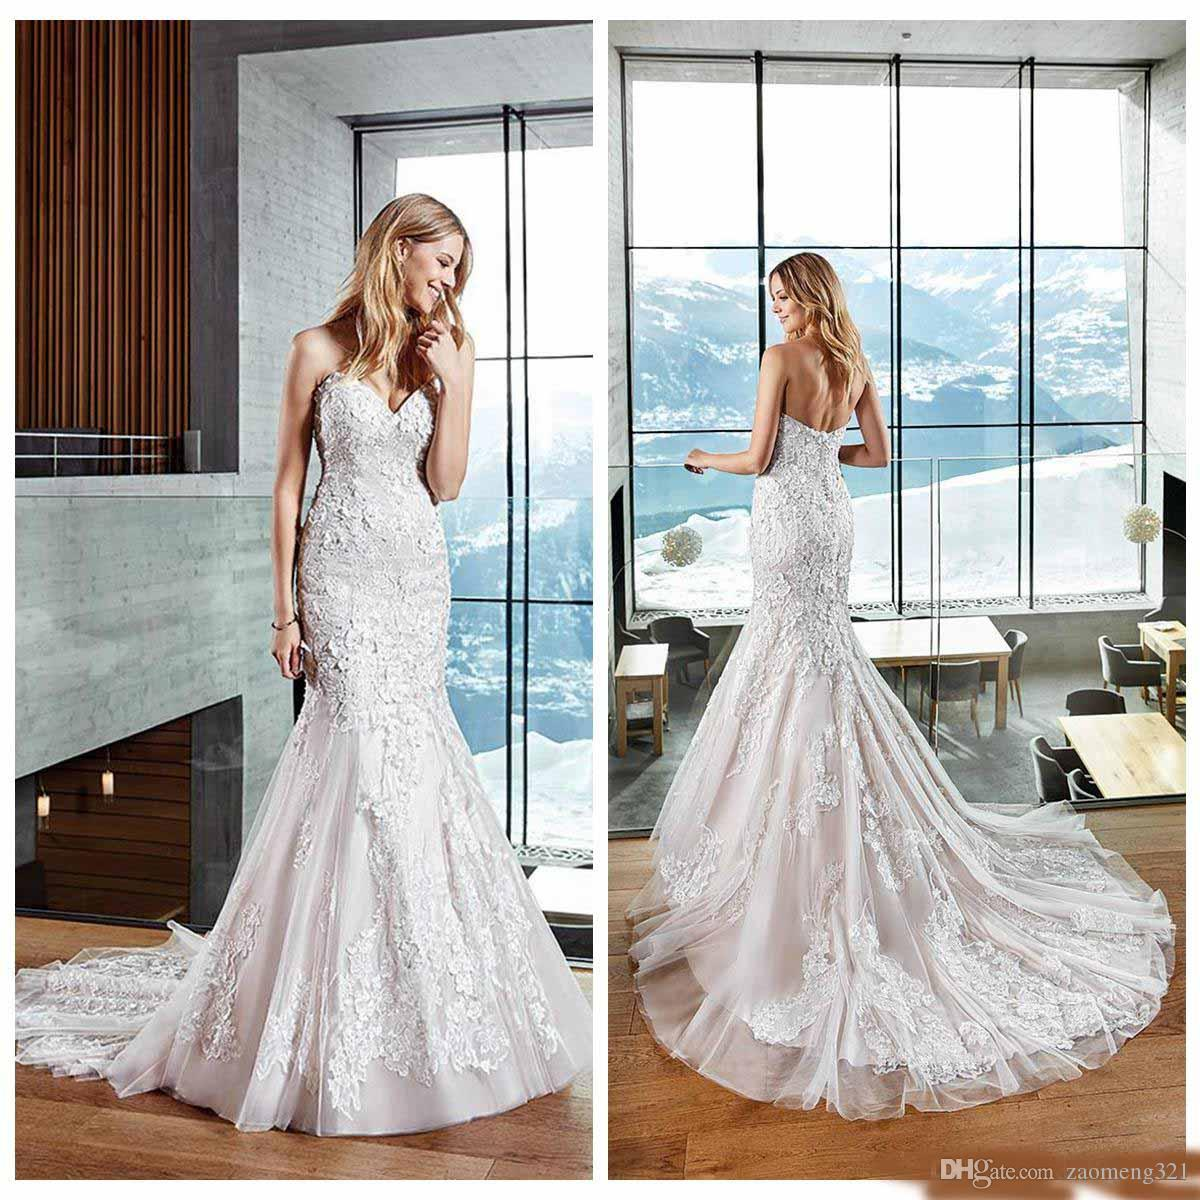 Vestidos de Novia Mermaid Wedding Dresses 2020 Strapless Backless Sleeveless Floor Length Tulle Applique Lace Vintage Plus Size Bridal Gowns